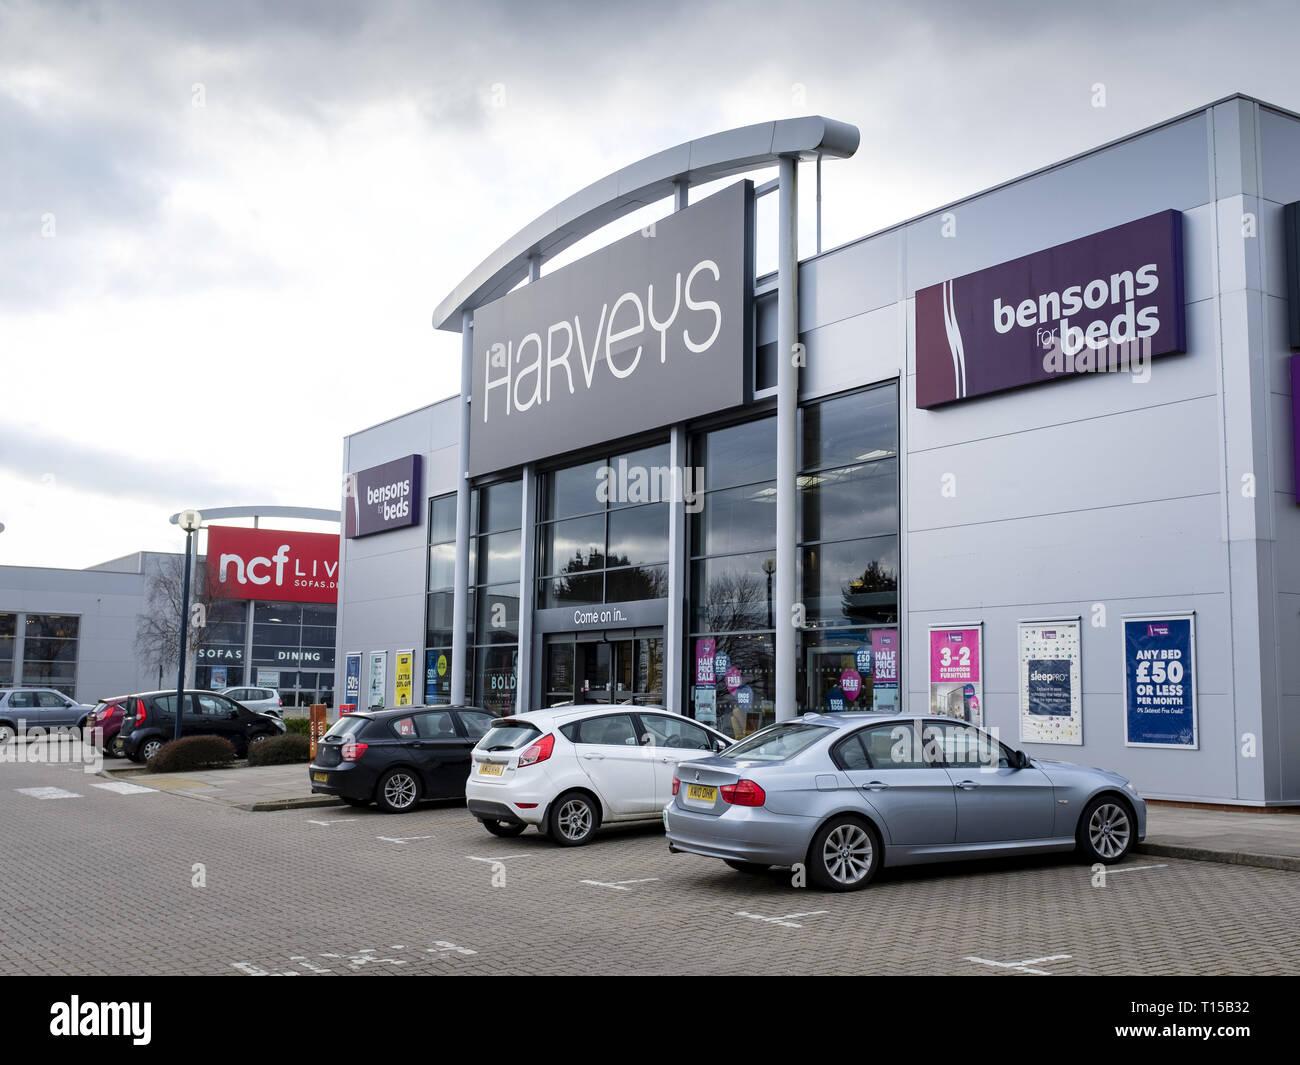 Milton Keynes, UK - February 11, 2019. Exterior of a Harveys furniture store on a retail park. - Stock Image